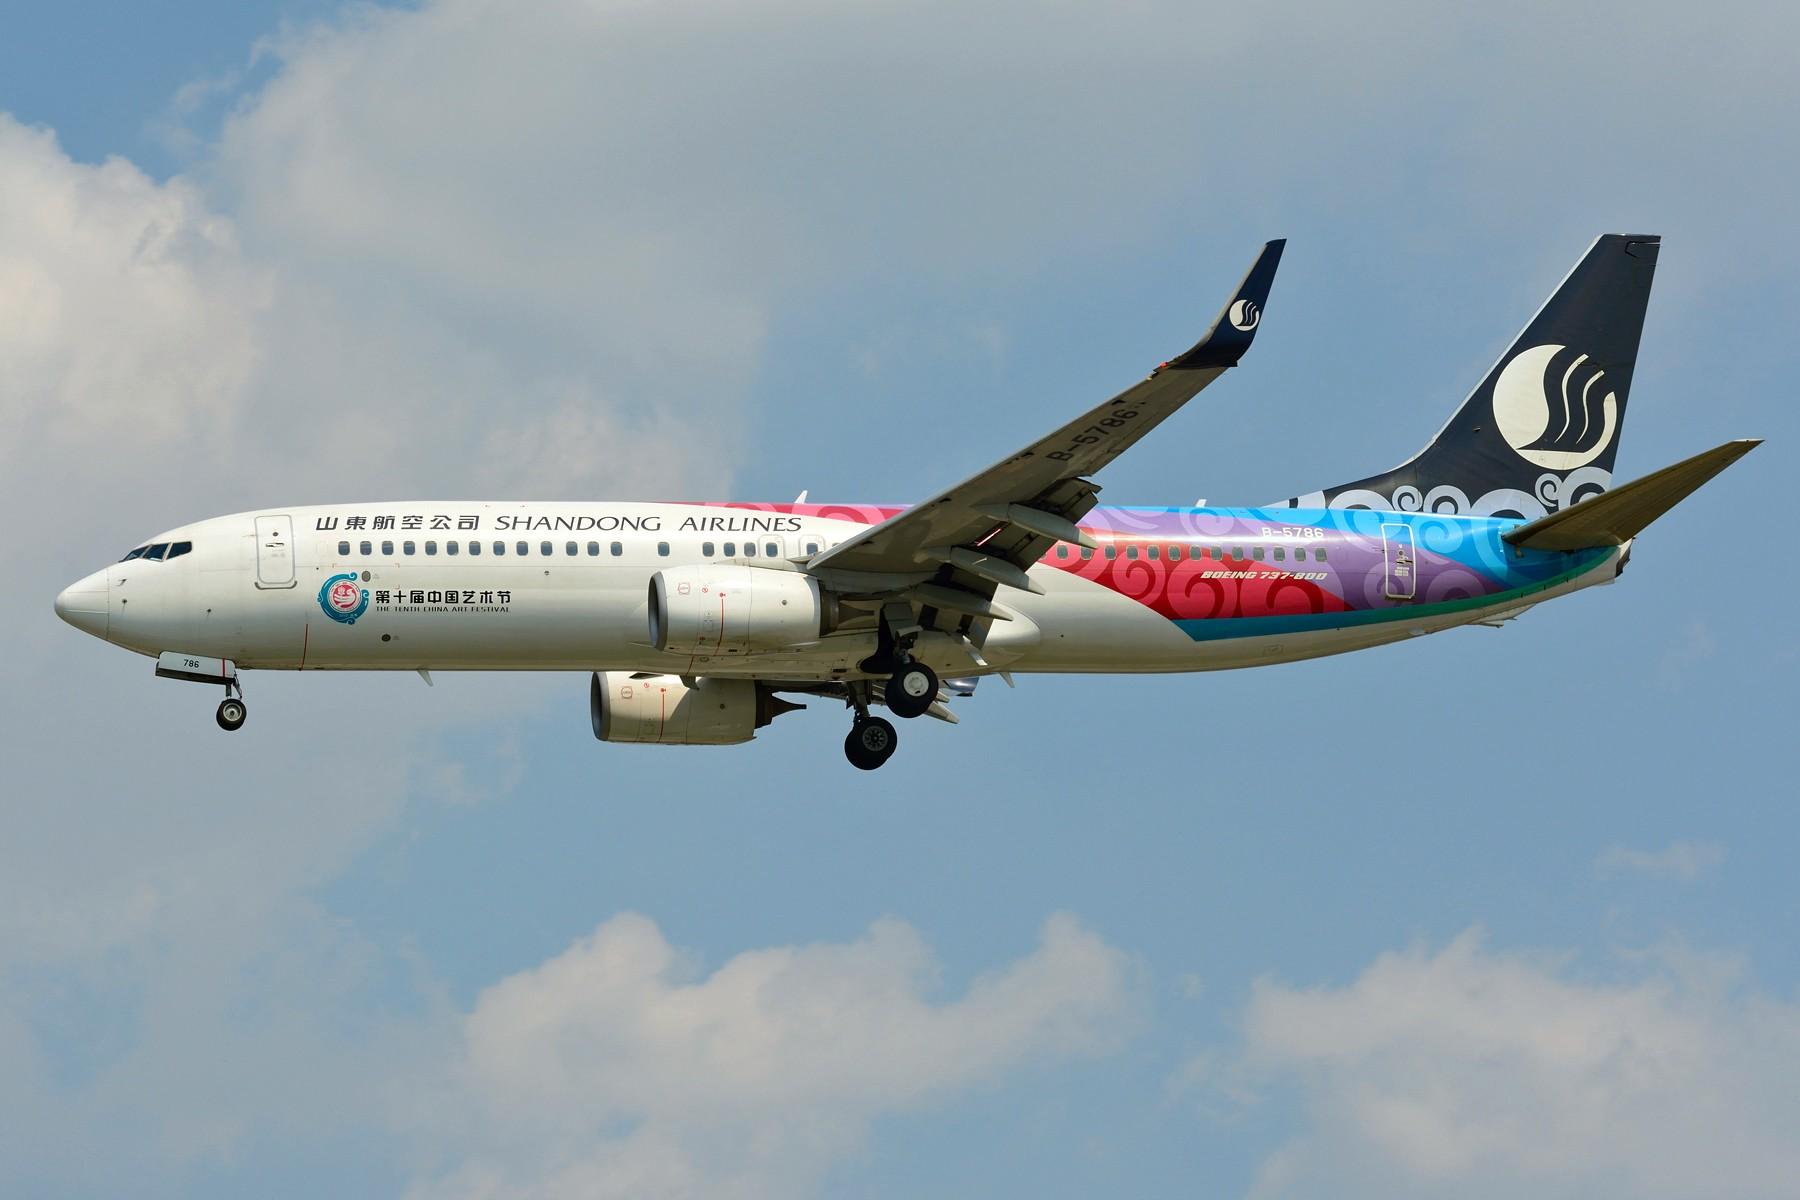 Re:[原创]【SHA】山东航空第一架景芝号彩绘 B-7977 BOEING 737-800 B-5786 中国上海虹桥国际机场